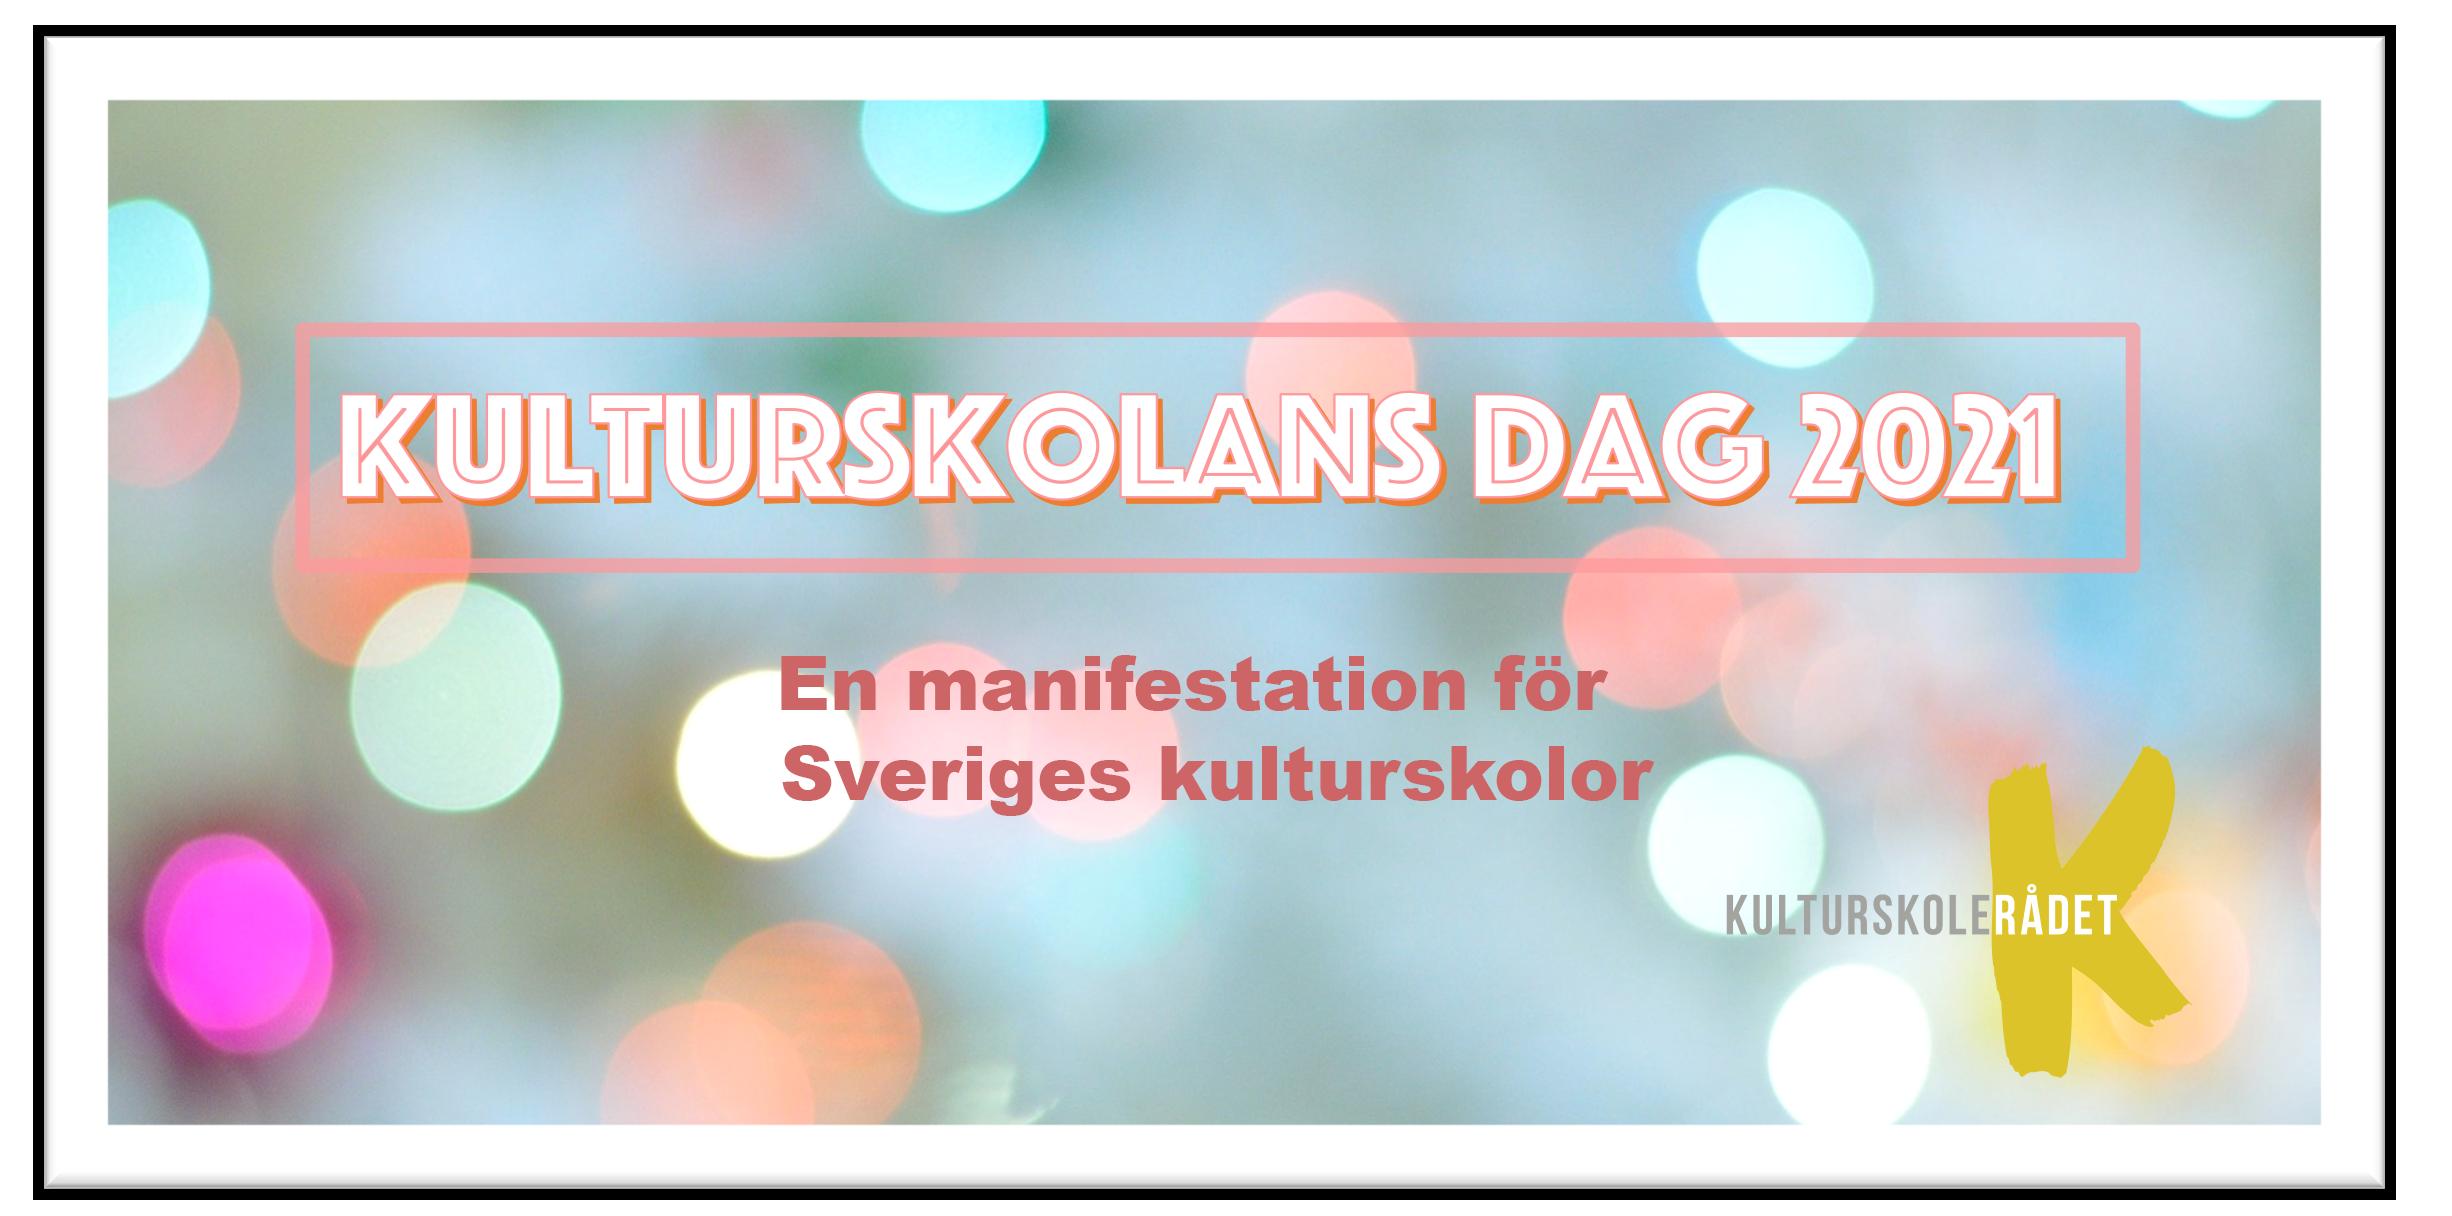 Kulturskolans dag platta hemsida